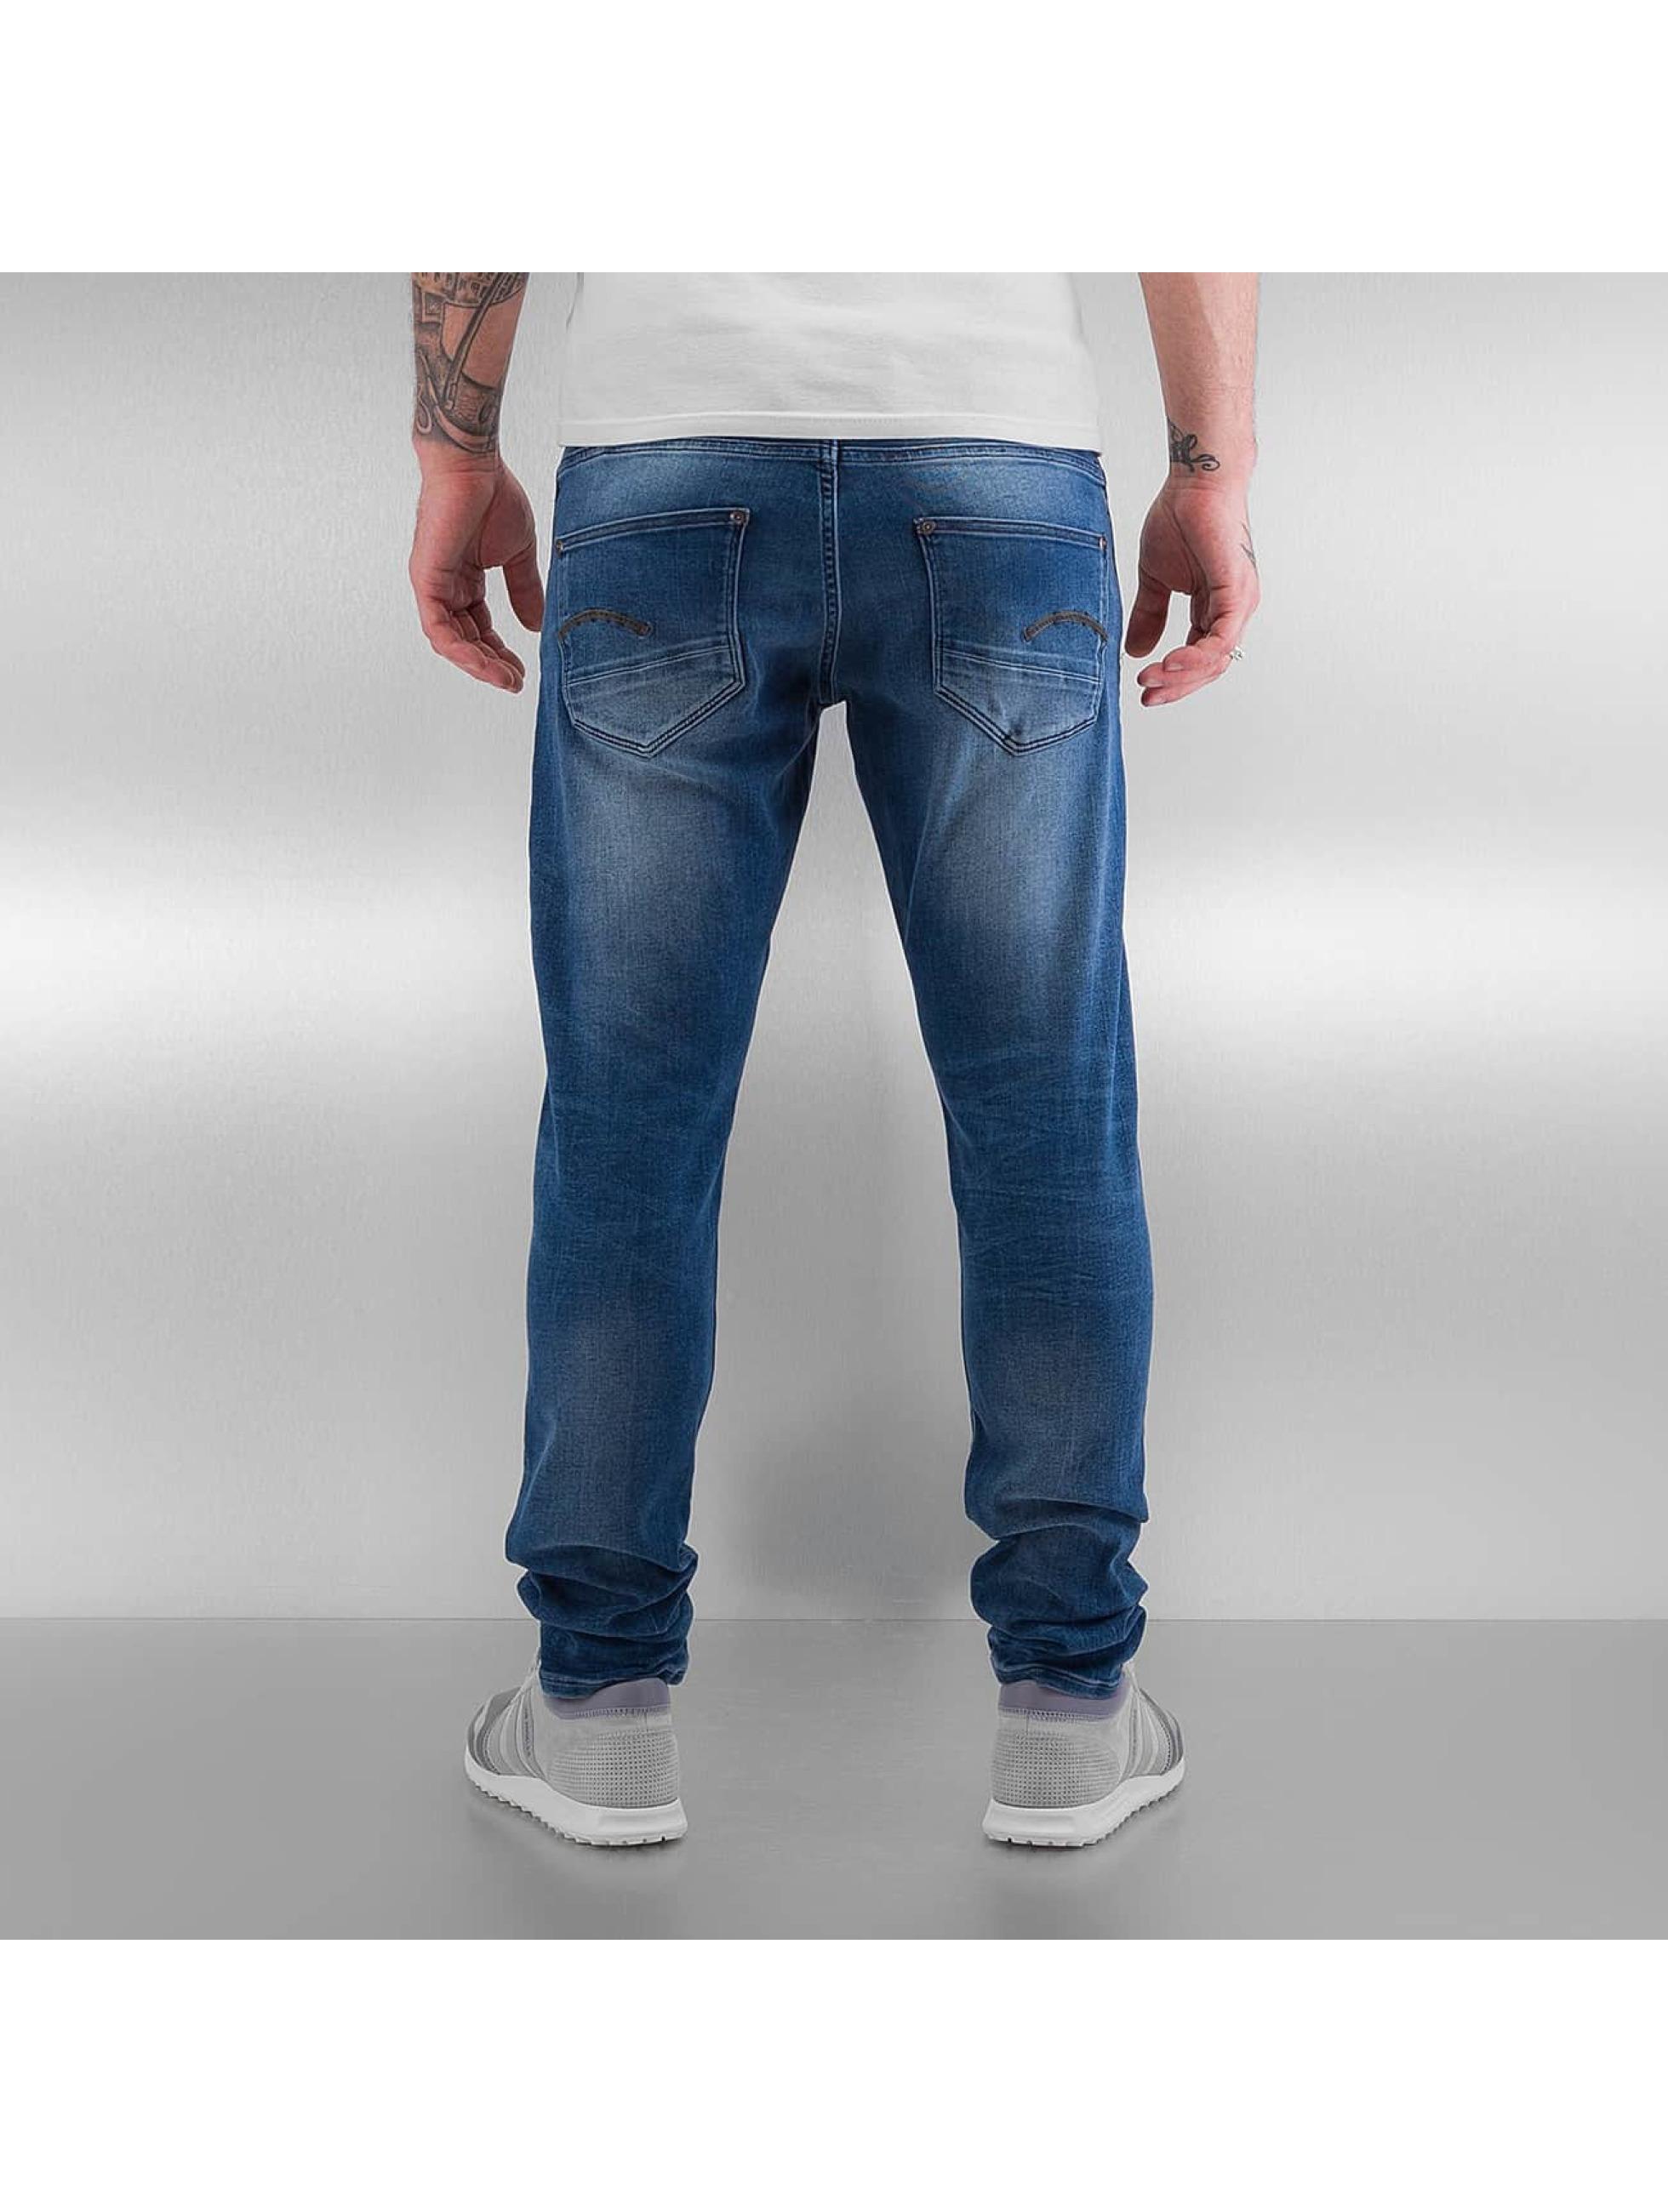 G-Star Skinny jeans Revend Super Slim Slander blauw